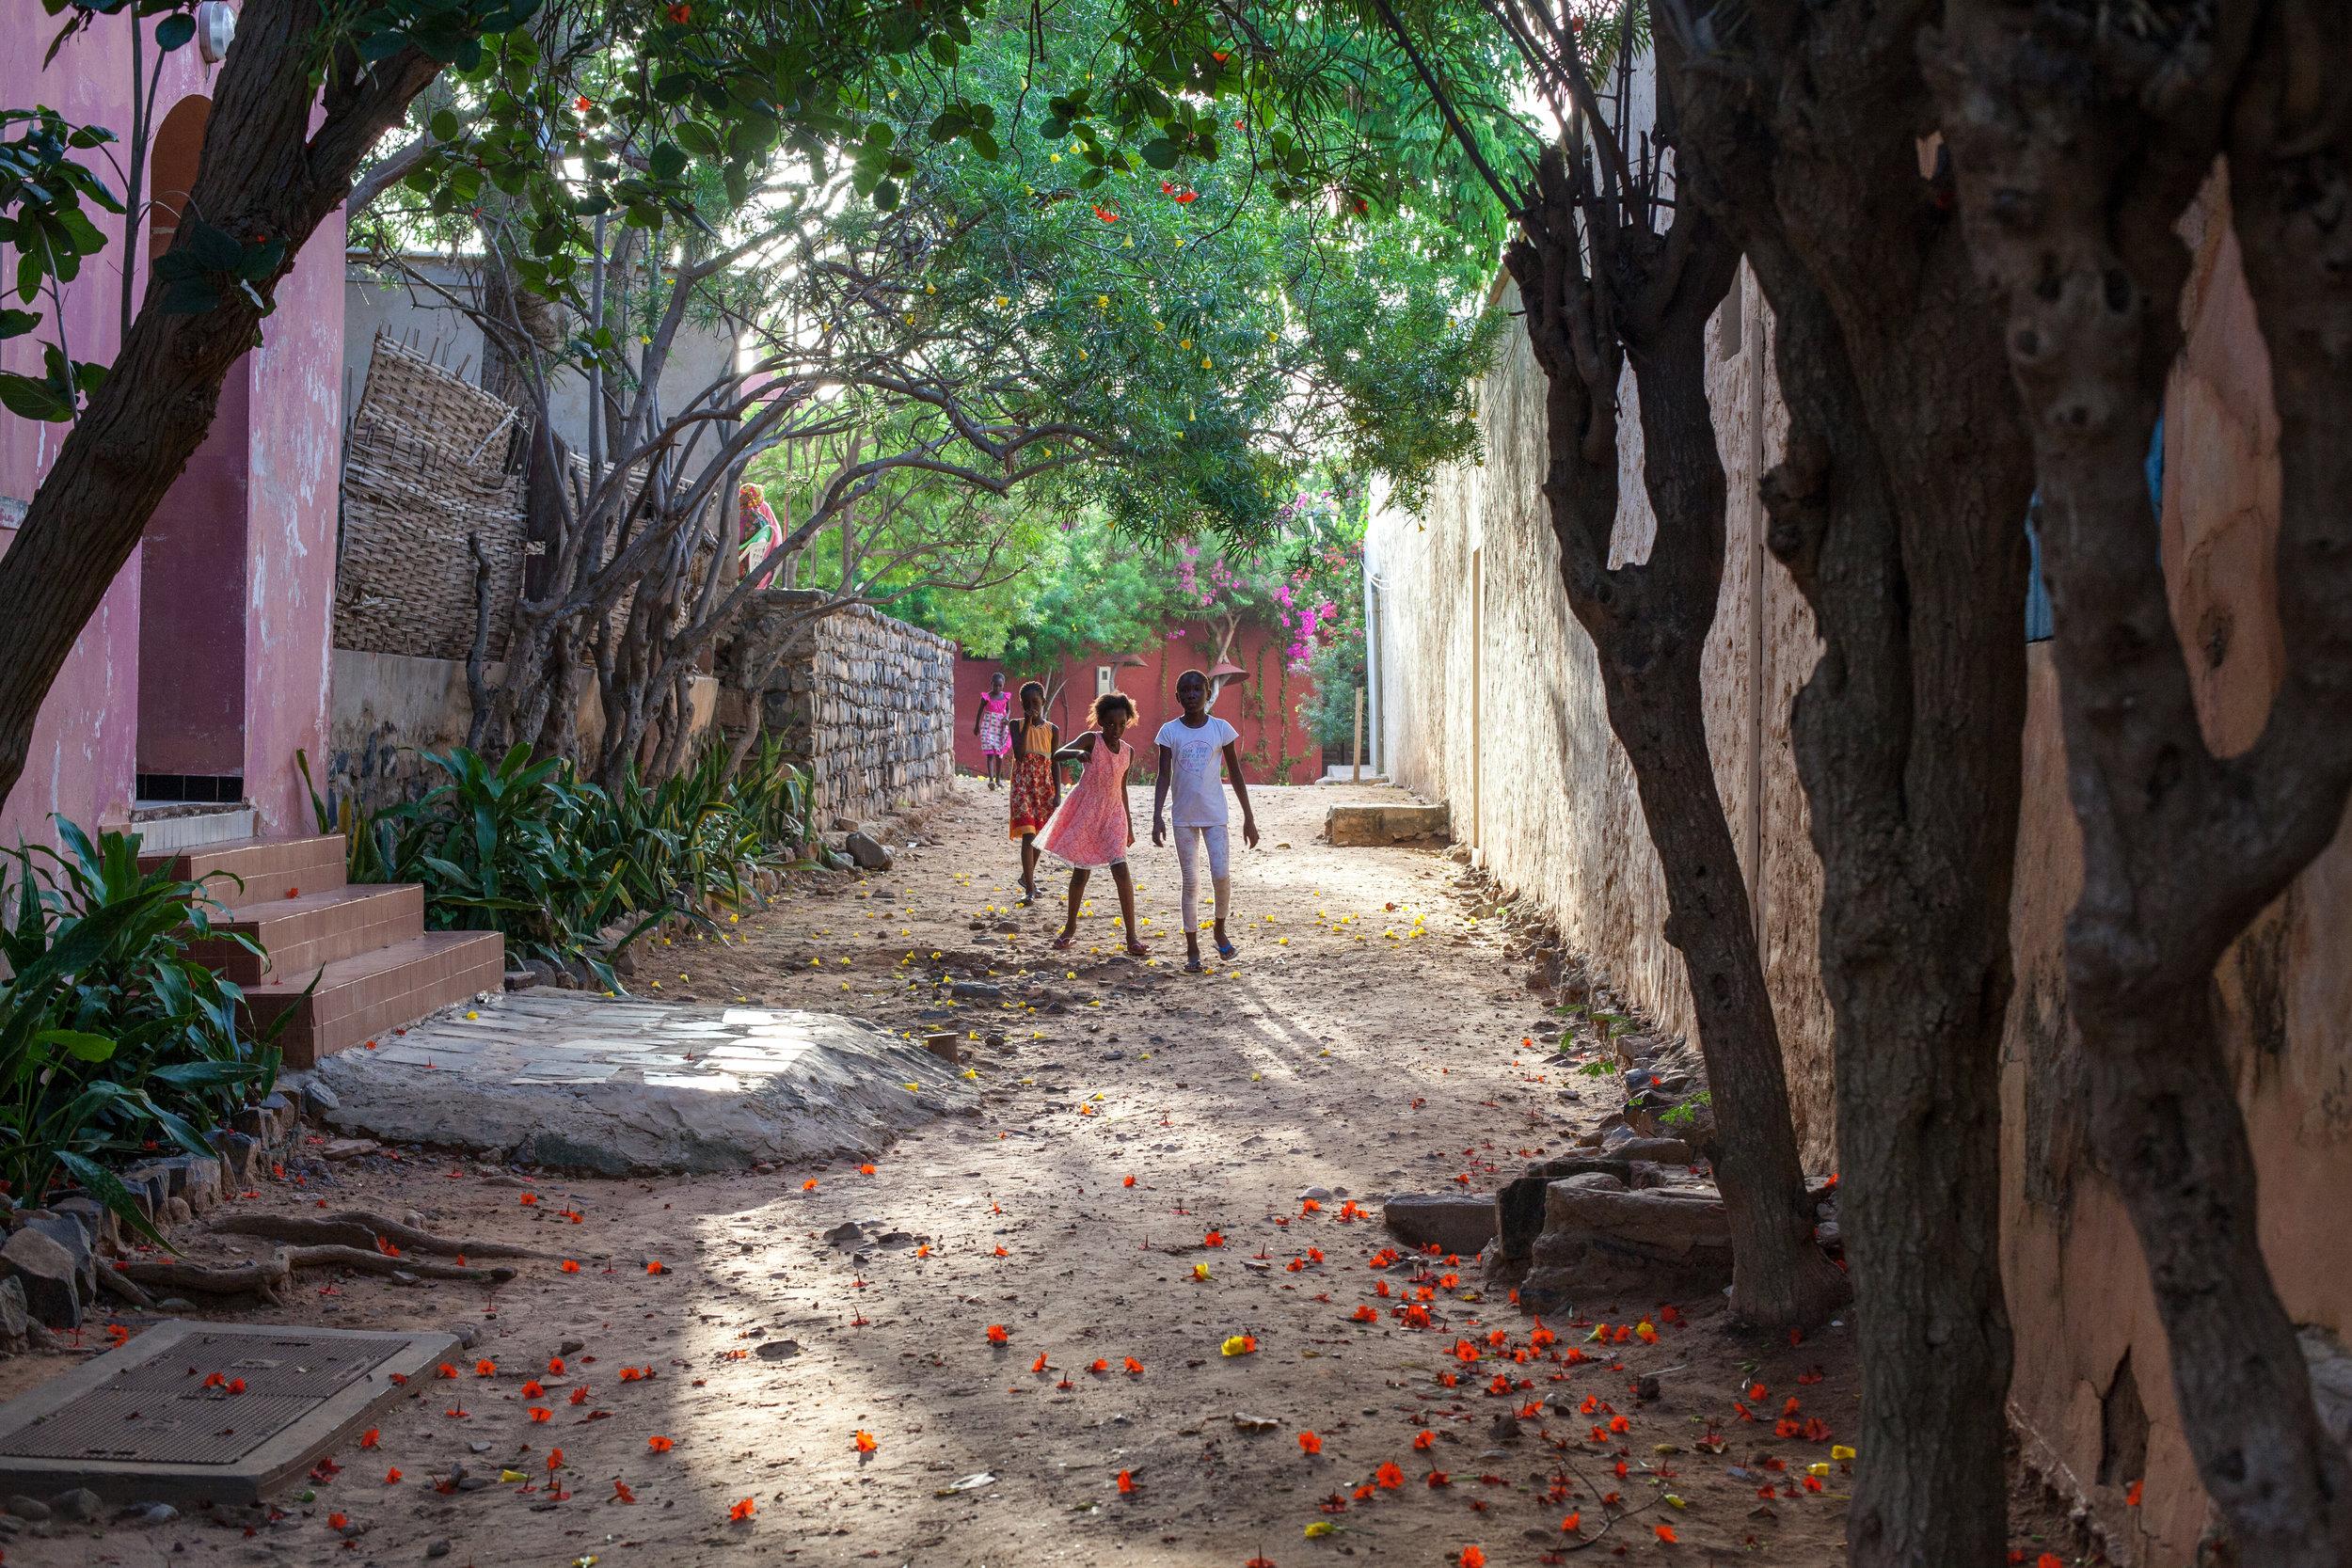 Beautiful backstreets on the Island of Gorée, Dakar, Senegal.